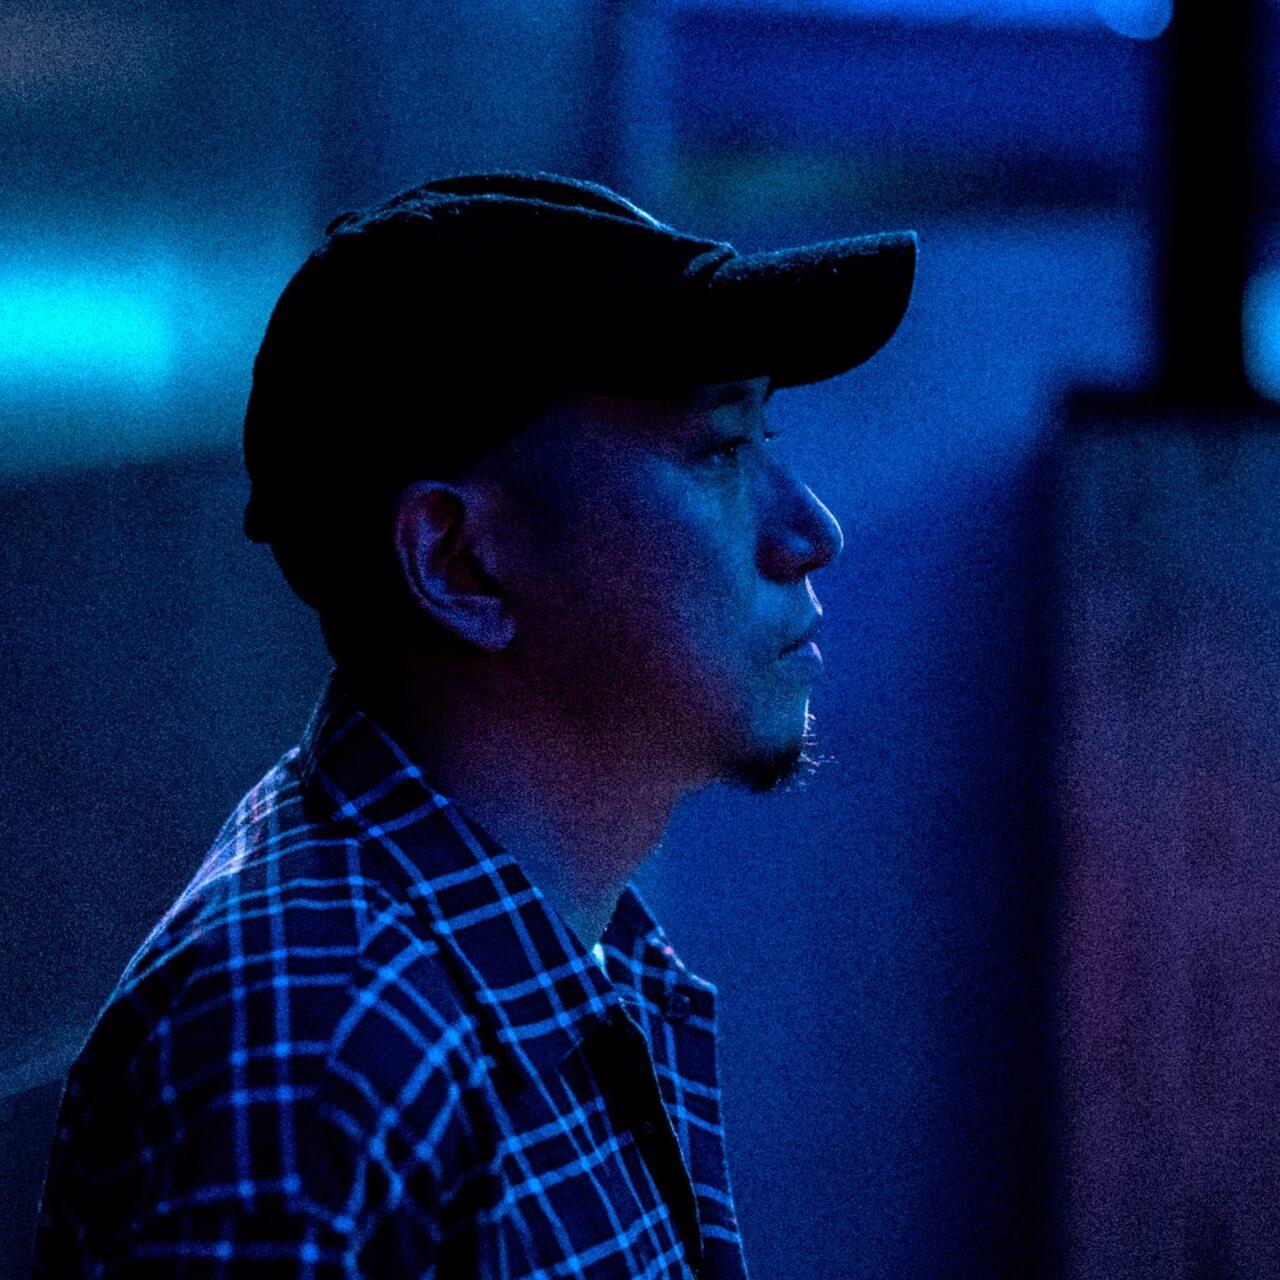 COBA5000が新曲「Into Da Swamp」をリリース|プロデュースはNaBTok music210724-coba5000-1